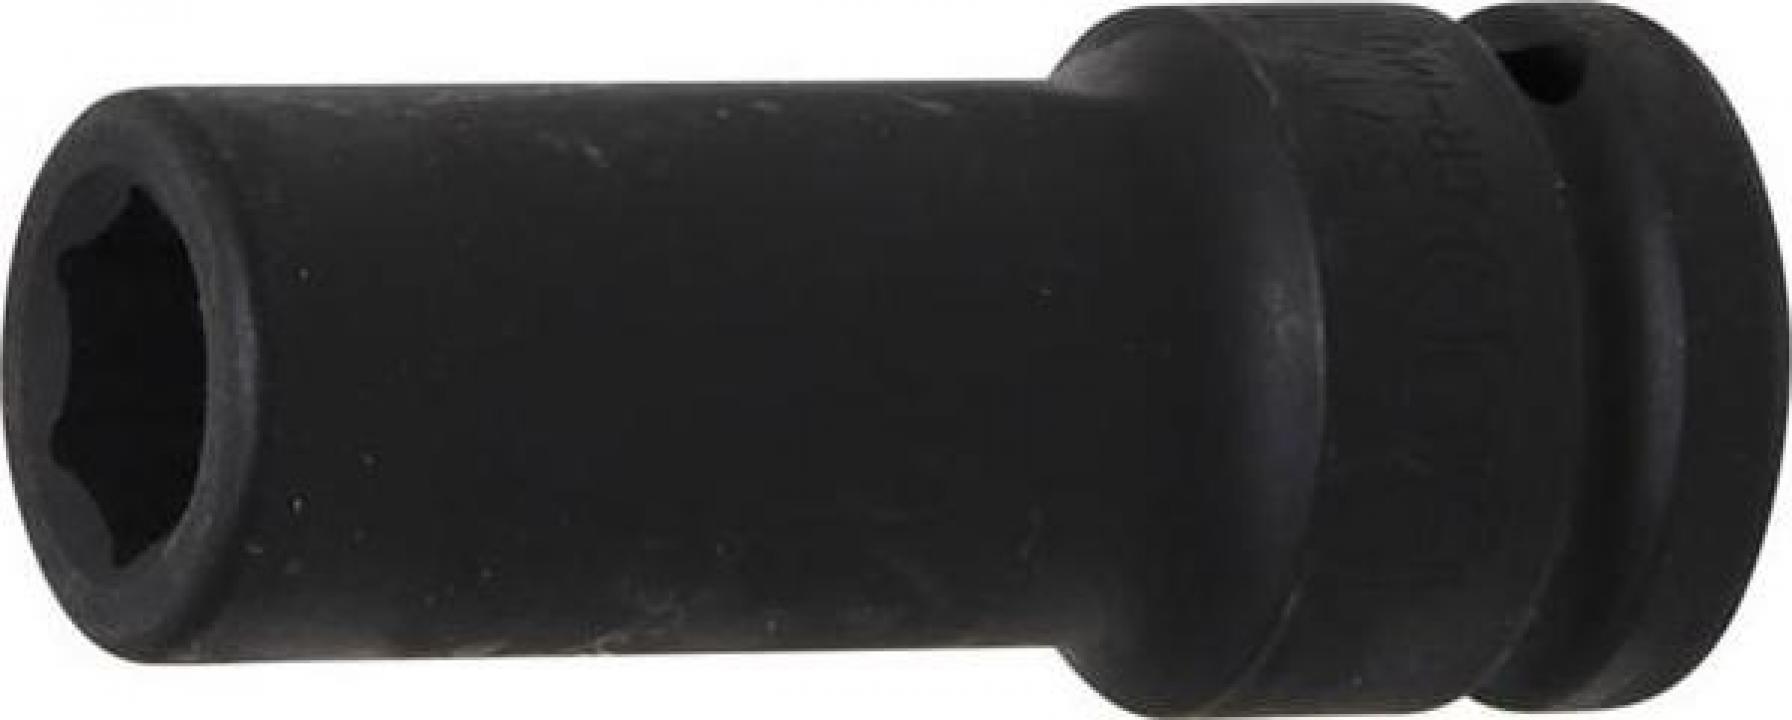 "Tubulara 17mm Impact 3/4"" cu 6 pereti - 5717- BGS technic"